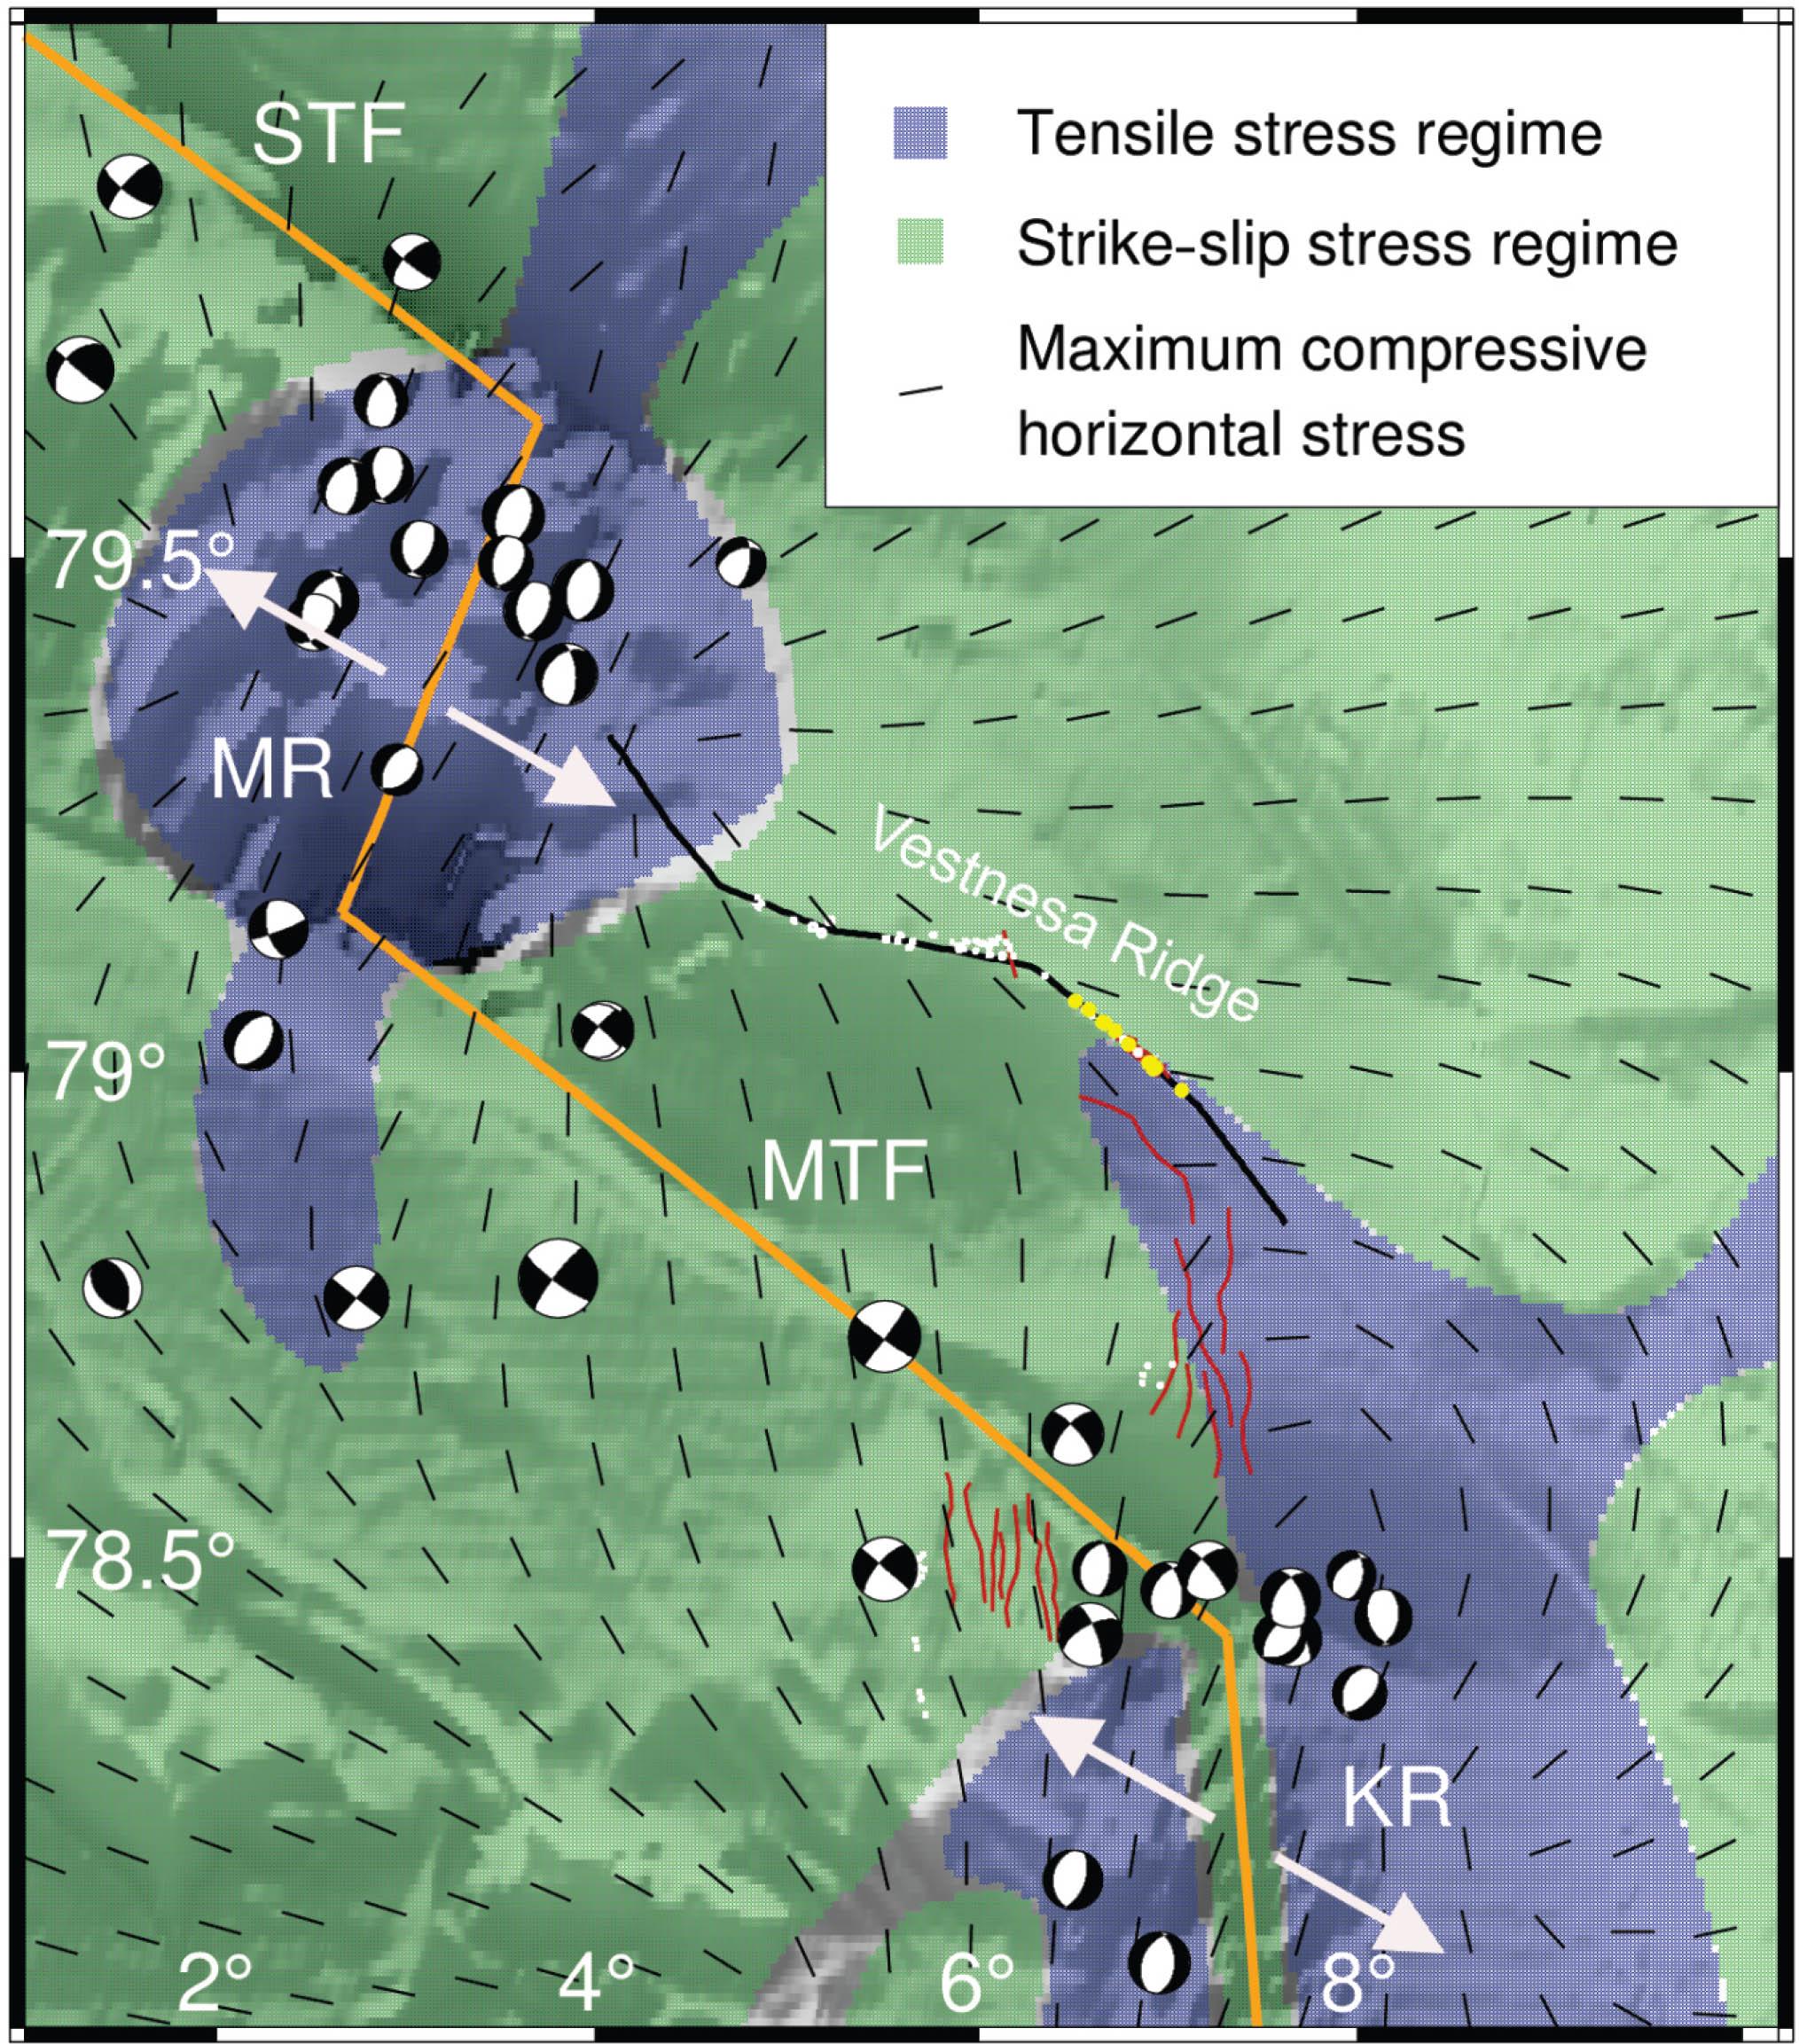 SE - Correlation between tectonic stress regimes and methane